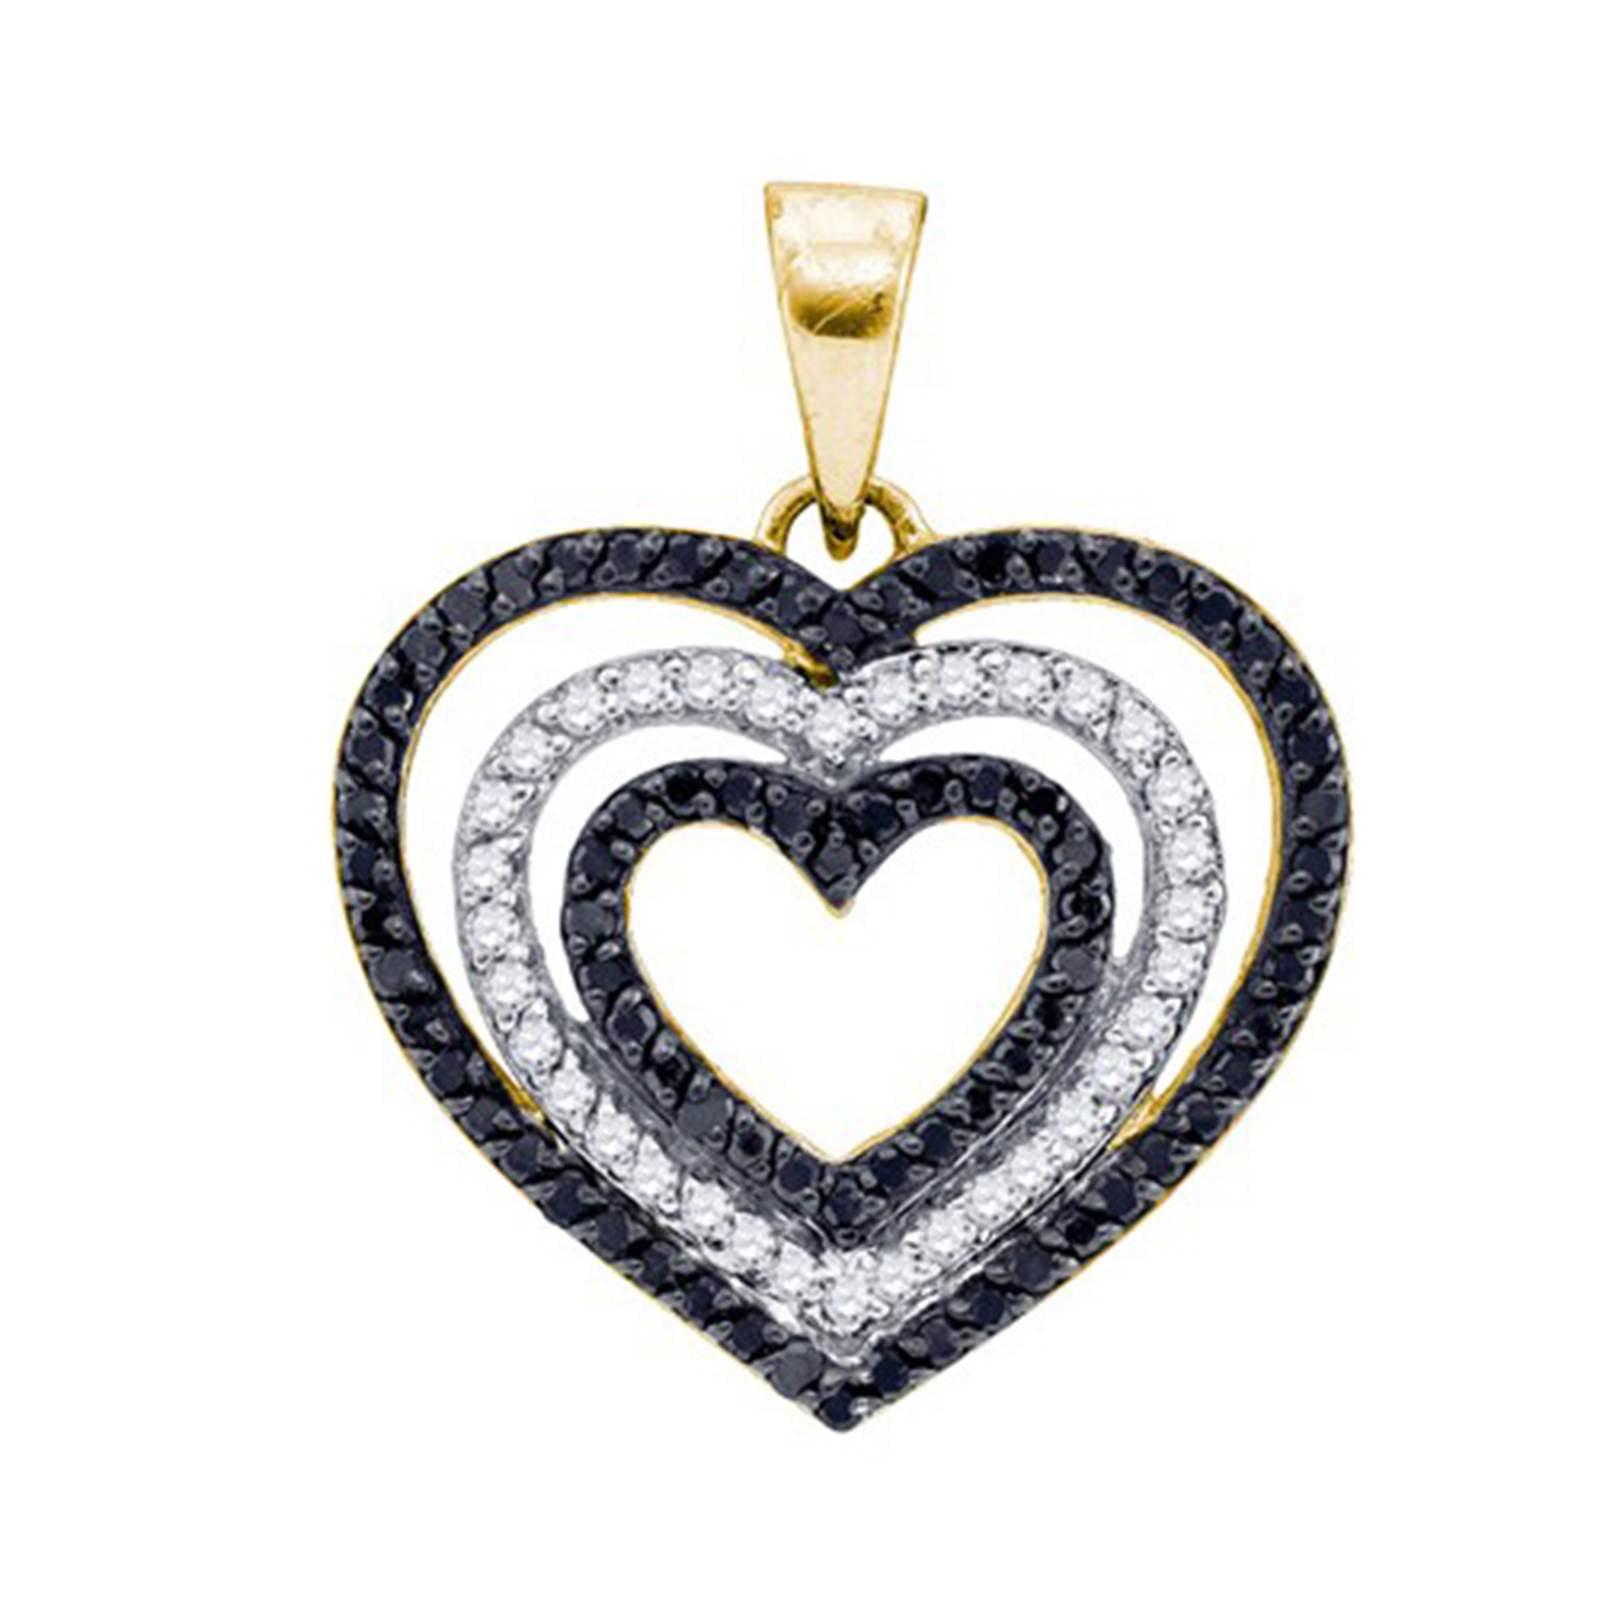 Ladies Yellow Gold Black and White Genuine Diamond Heart Pendant 0.62CT